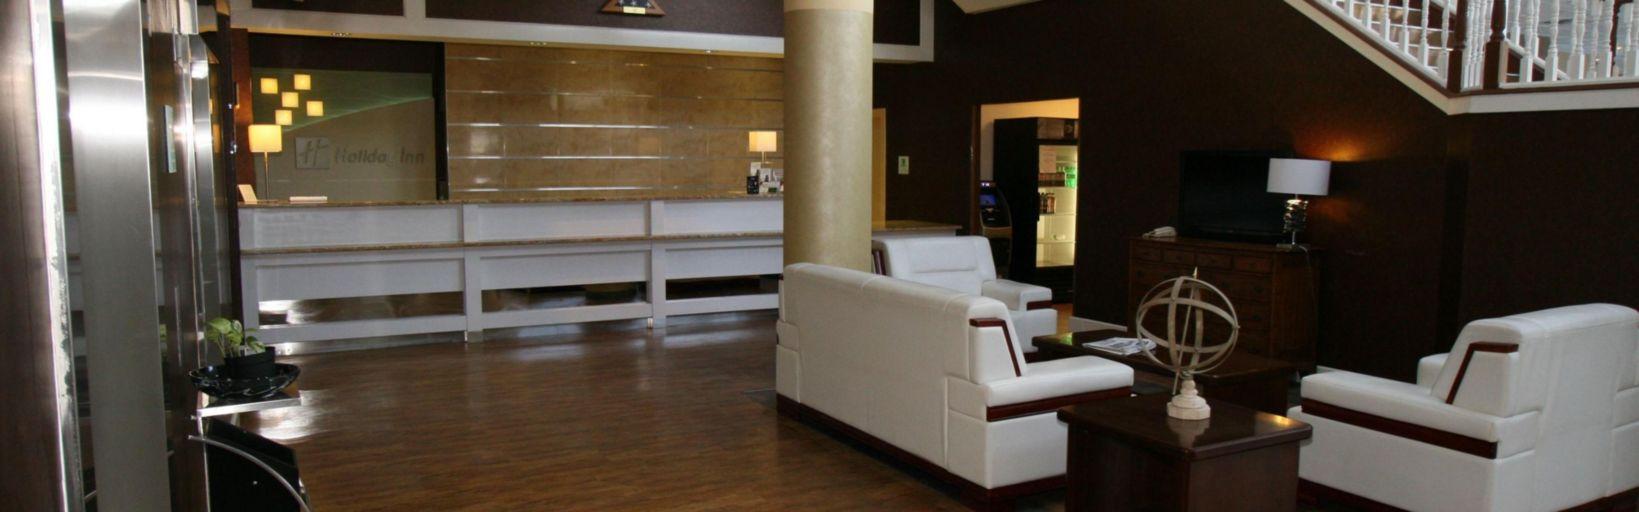 Front Desk Holiday Inn Clinton Hotel